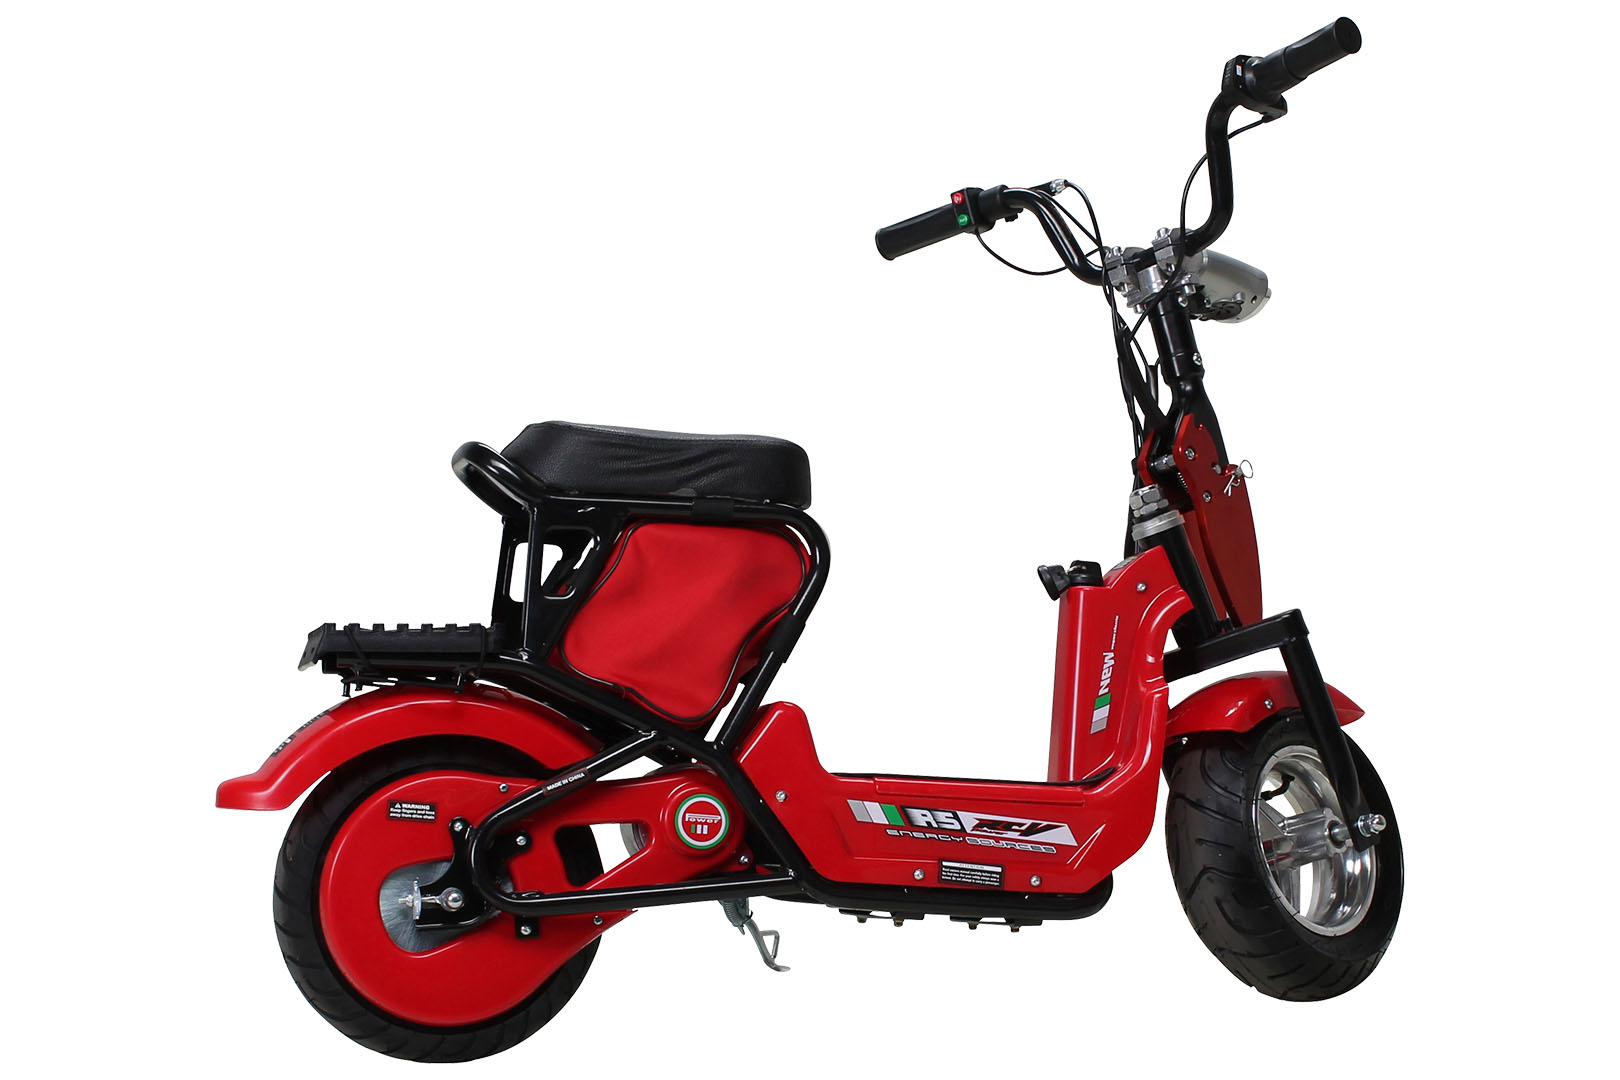 mini v lo lectrique minimoto scooter sq350dh 350 watt ebay. Black Bedroom Furniture Sets. Home Design Ideas